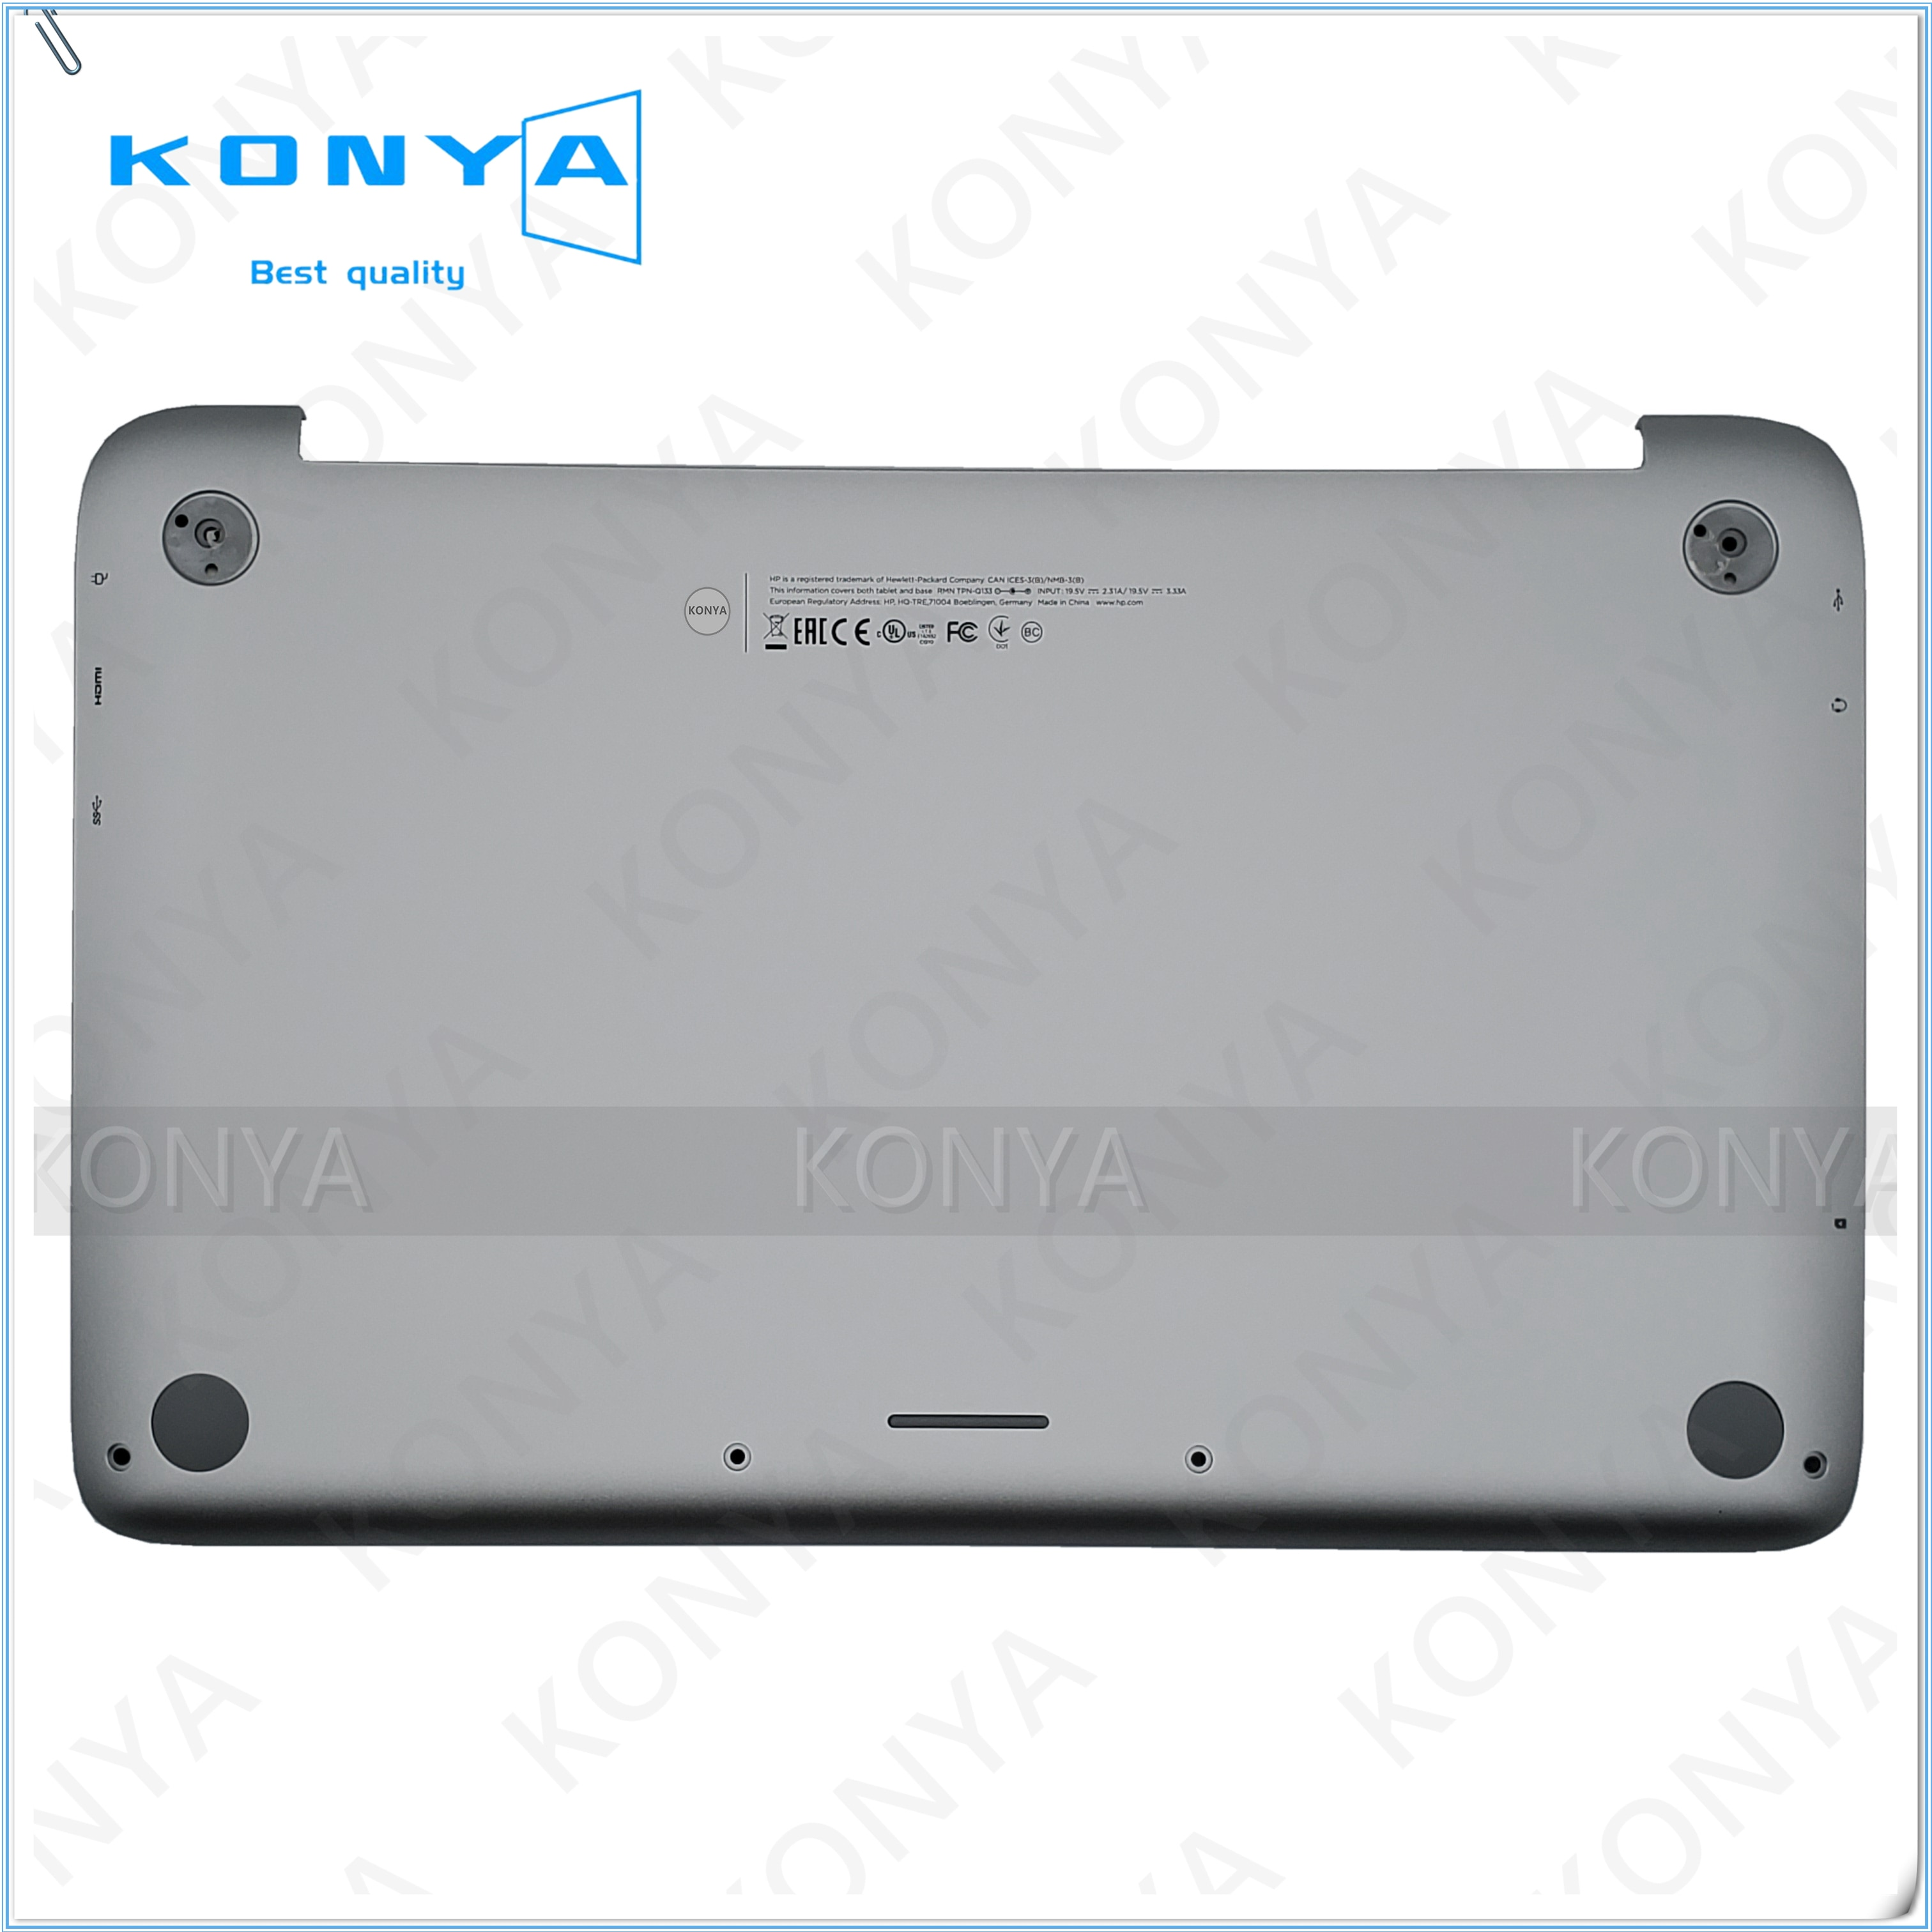 Novo Para HP Dividir X2 13-M 13-m002tu Laptop Inferior Caso Tampa Da Base Inferior EAW07004010 EAW05007010